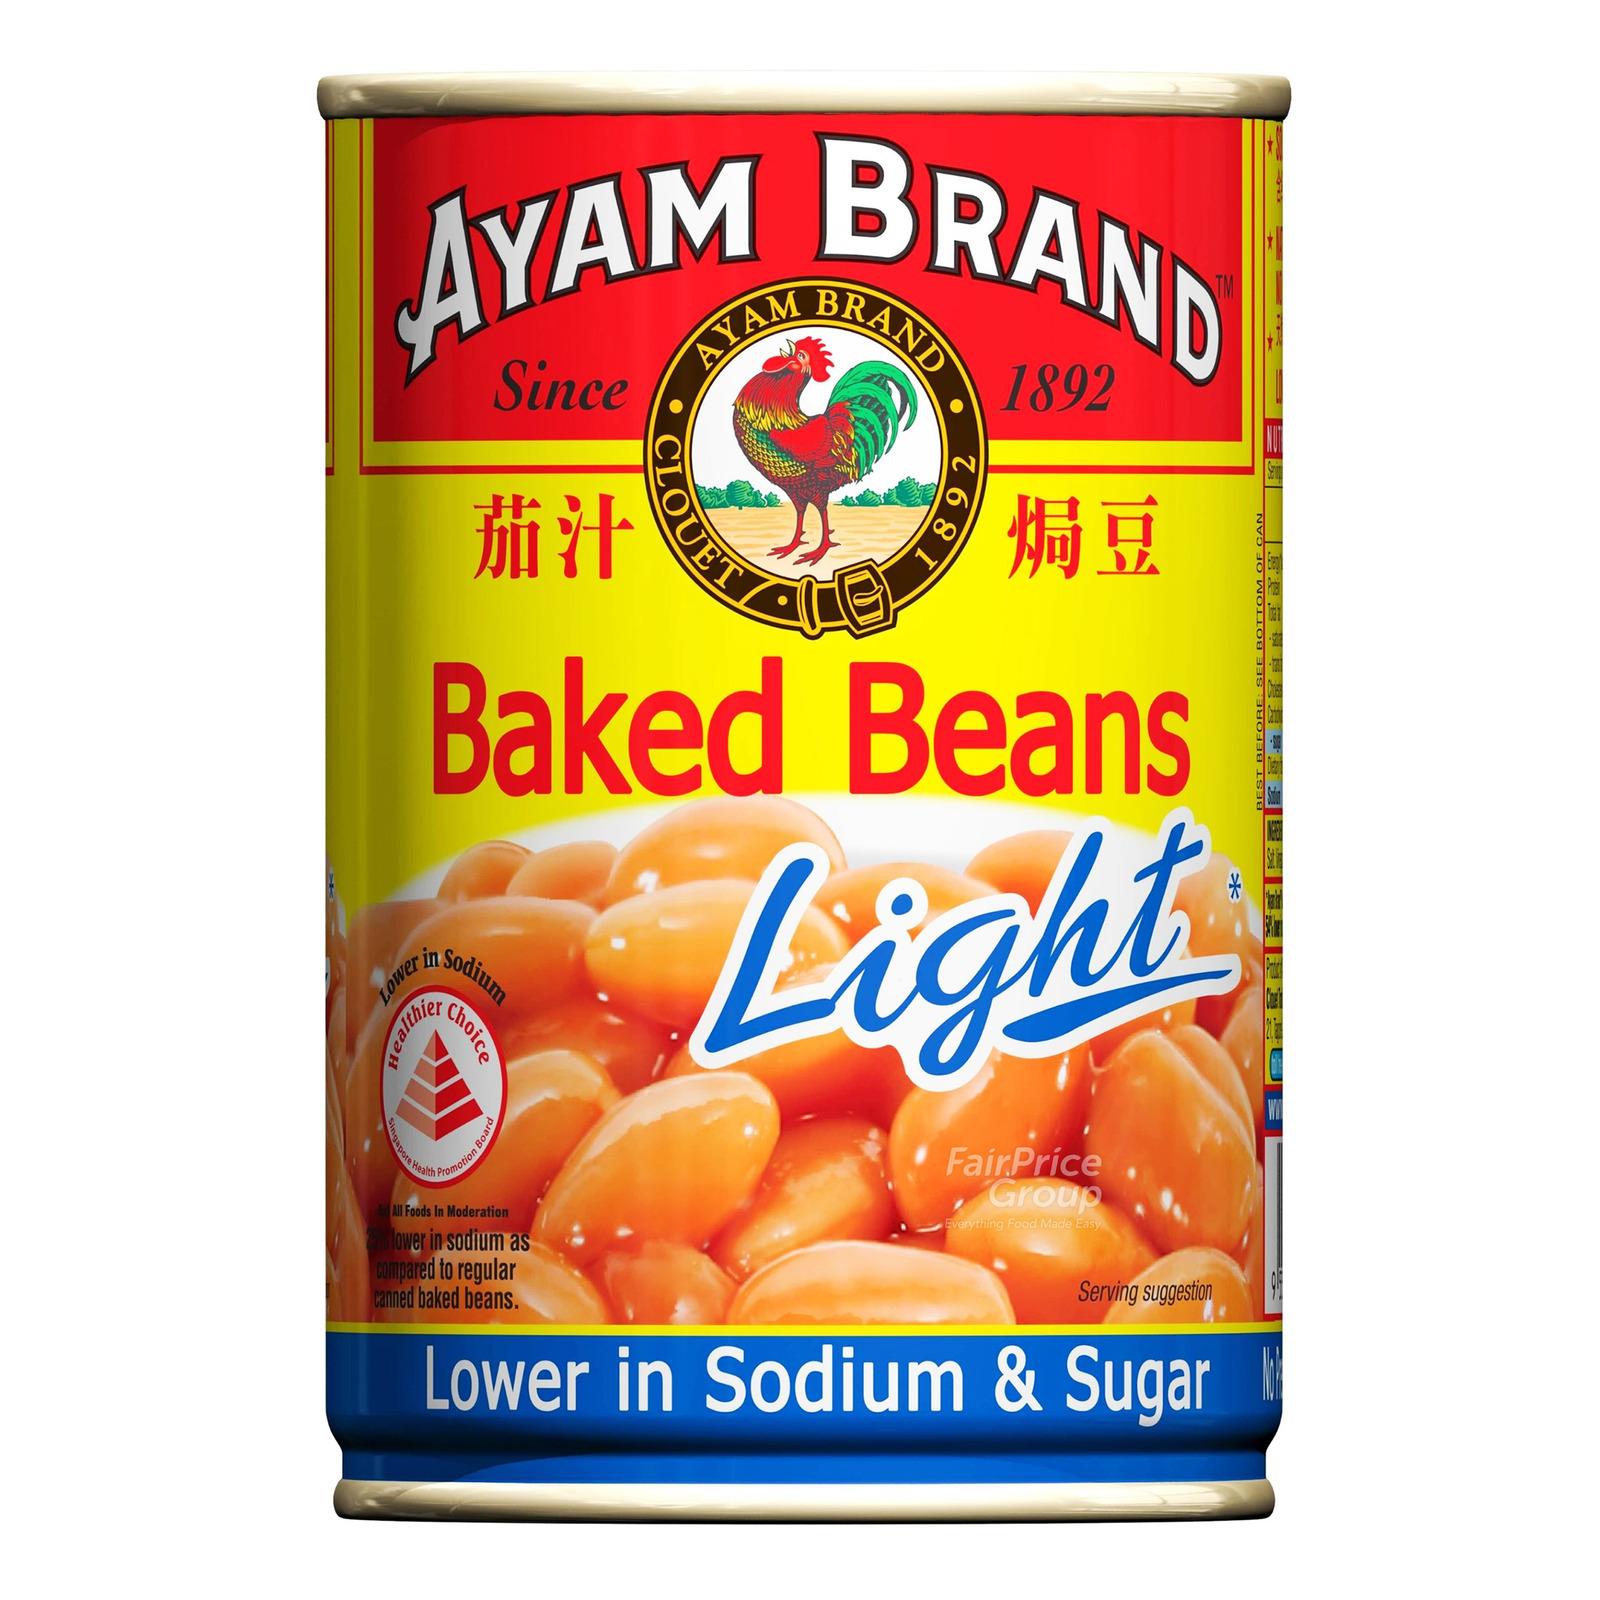 Ayam Brand Baked Beans Light Ntuc Fairprice